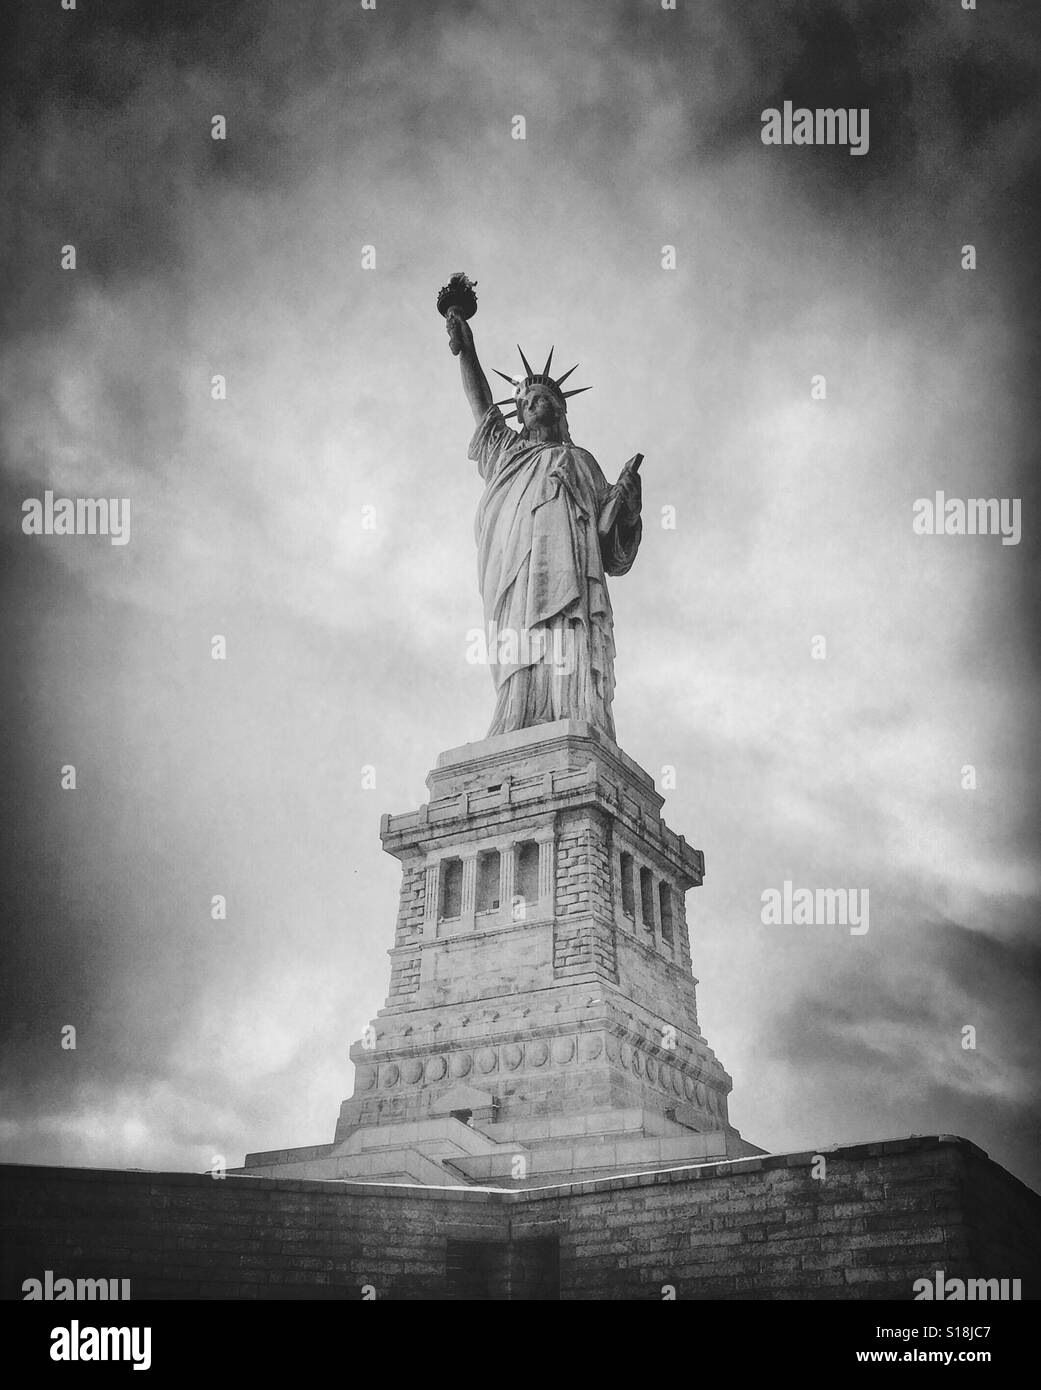 Statue of Liberty - New York - amazing fine art  photography Stock Photo